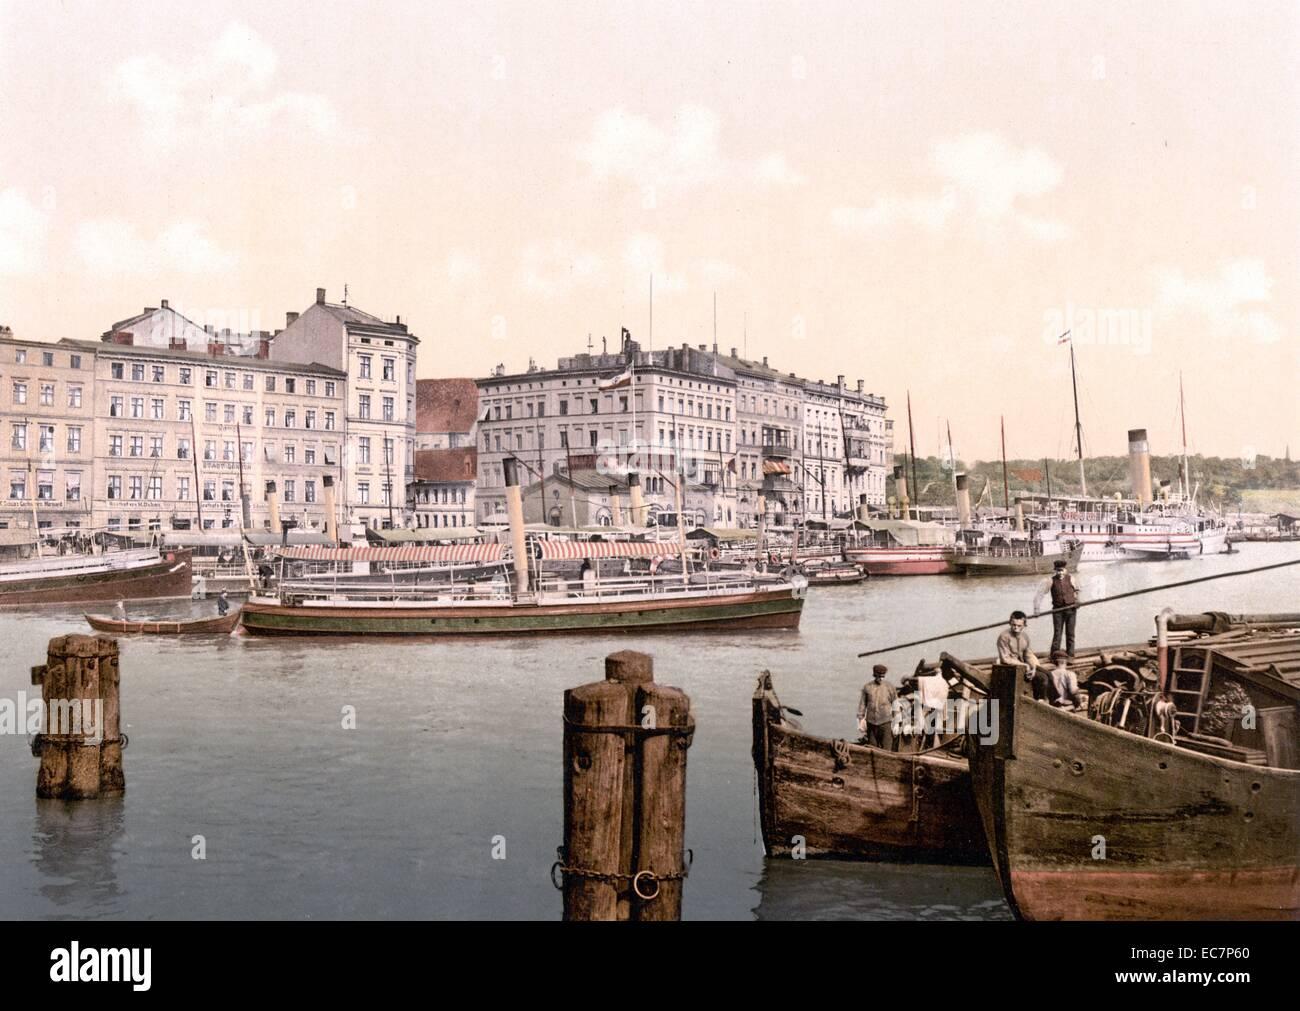 Steamship wharf, Stettin Harbour, Pomerania, Germany (Szczecin, Poland) - Stock Image